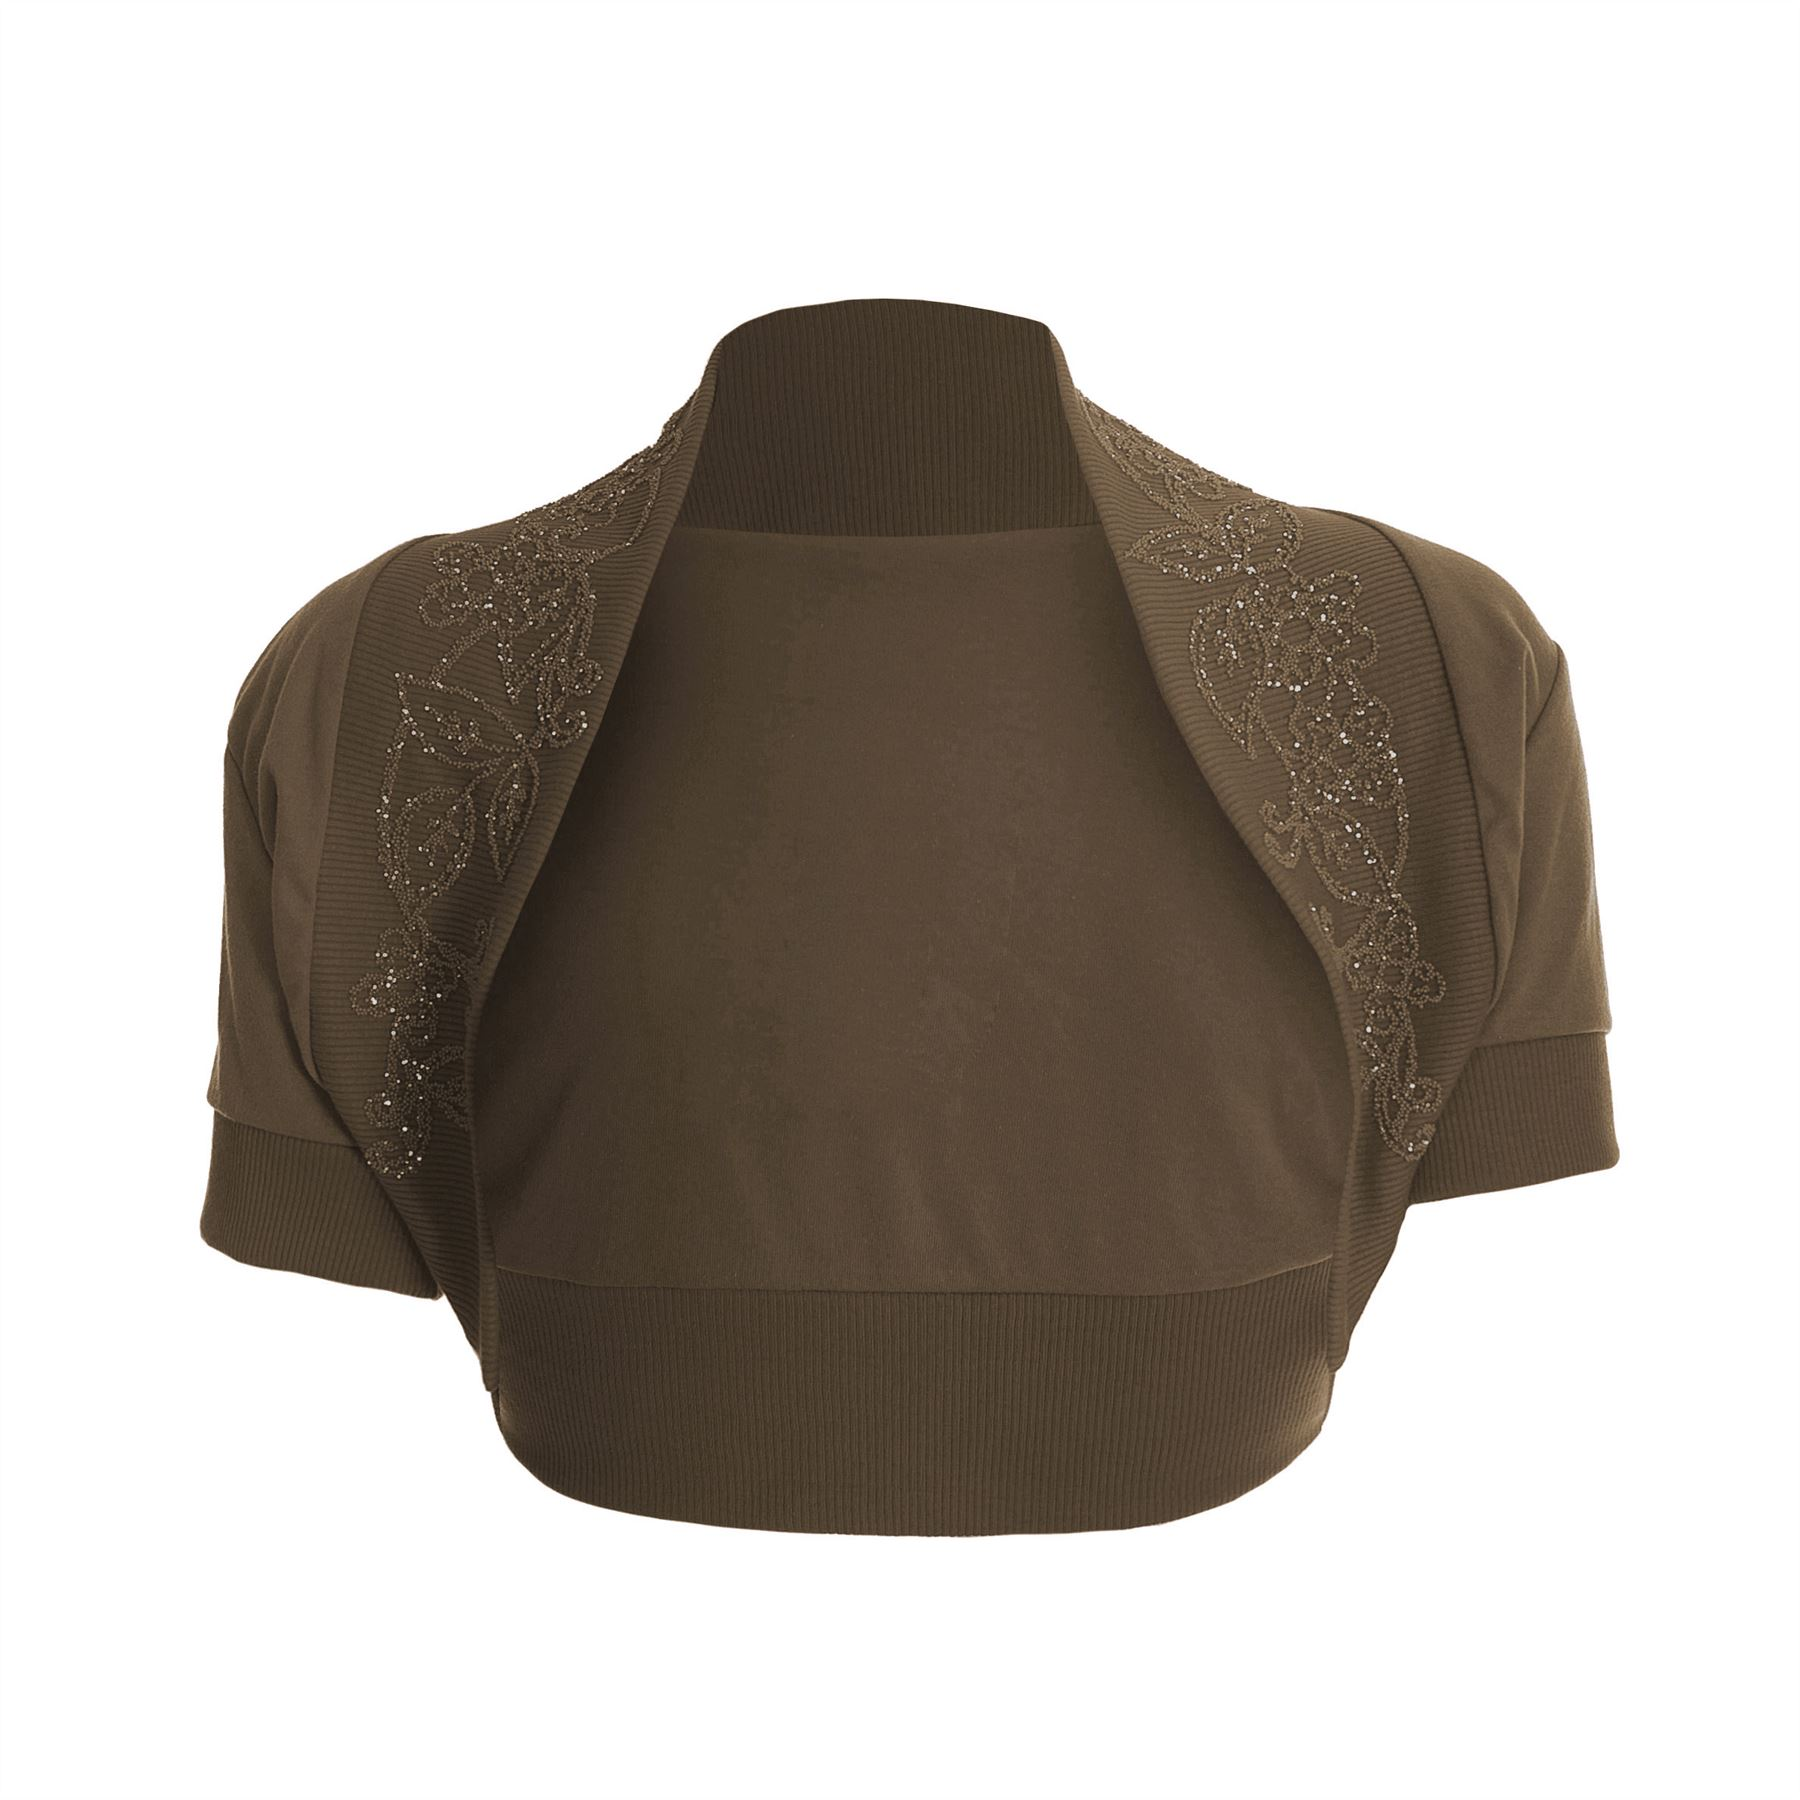 Womens-Cropped-Short-Sleeve-Ladies-Bolero-Open-Beaded-Sequin-Shrug-Top-Plus-Size